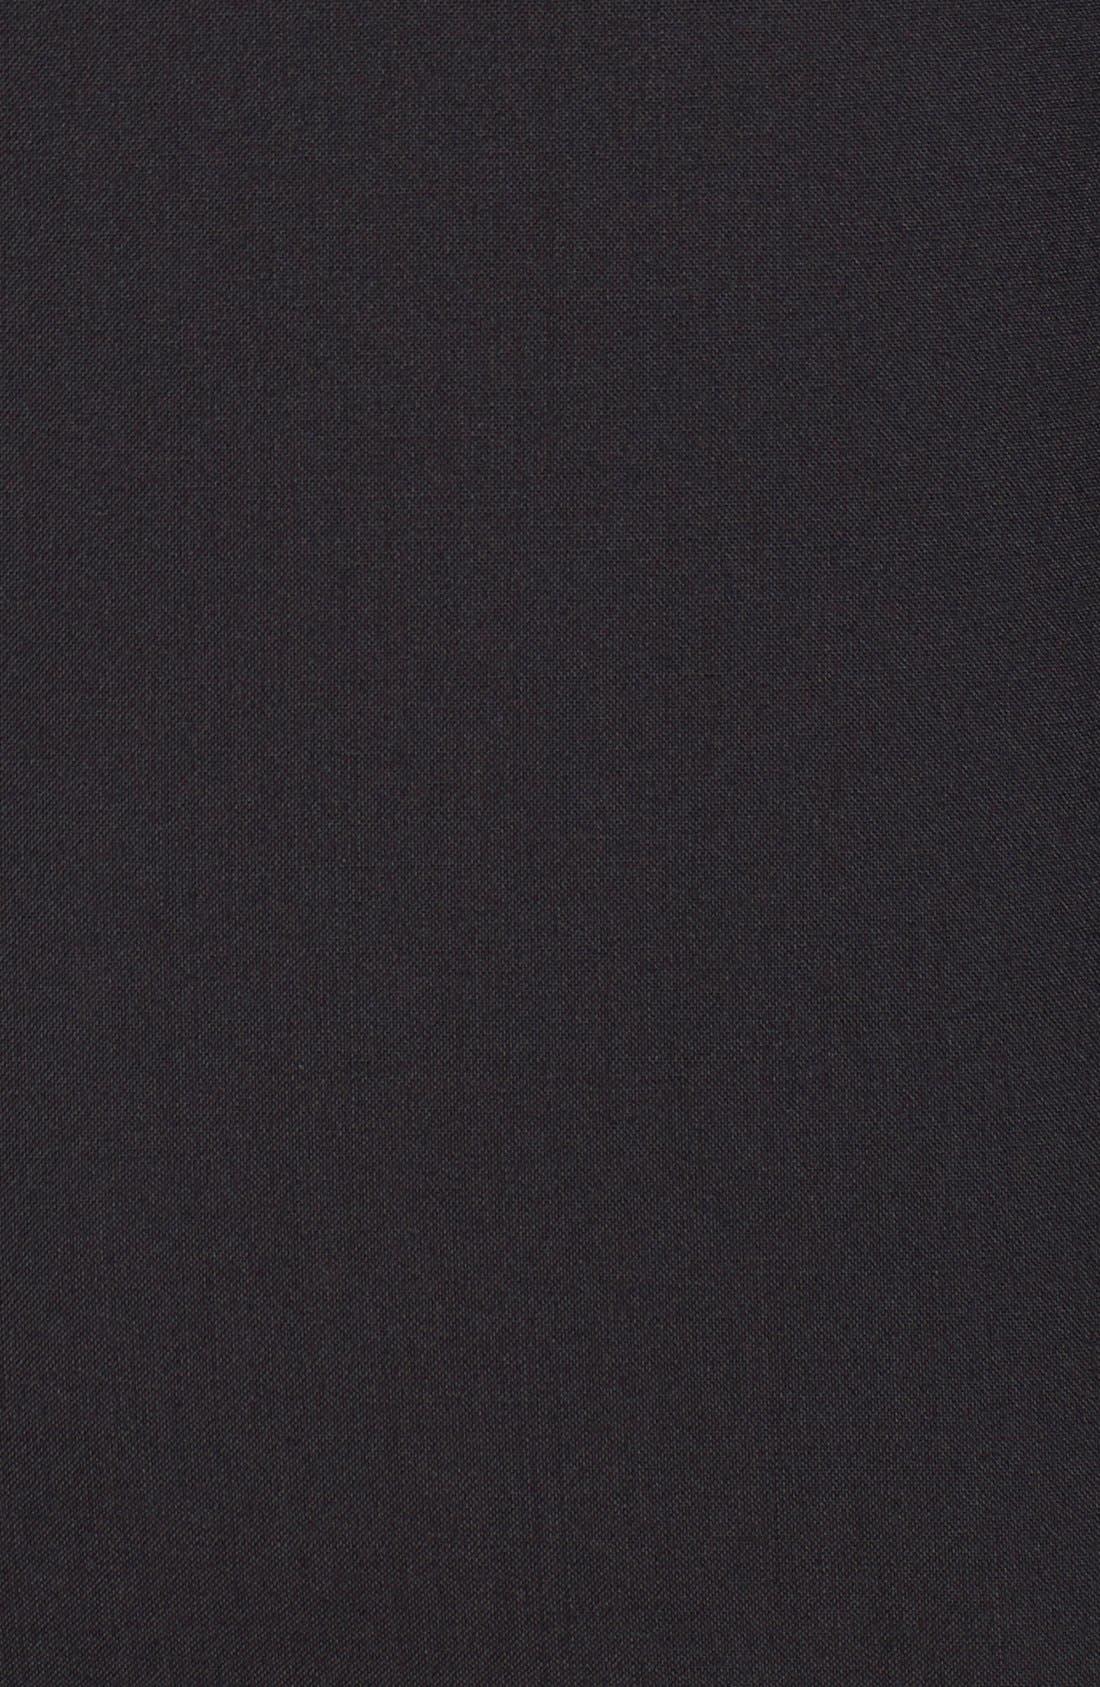 Trim Fit Wool Tuxedo,                             Alternate thumbnail 9, color,                             BLACK